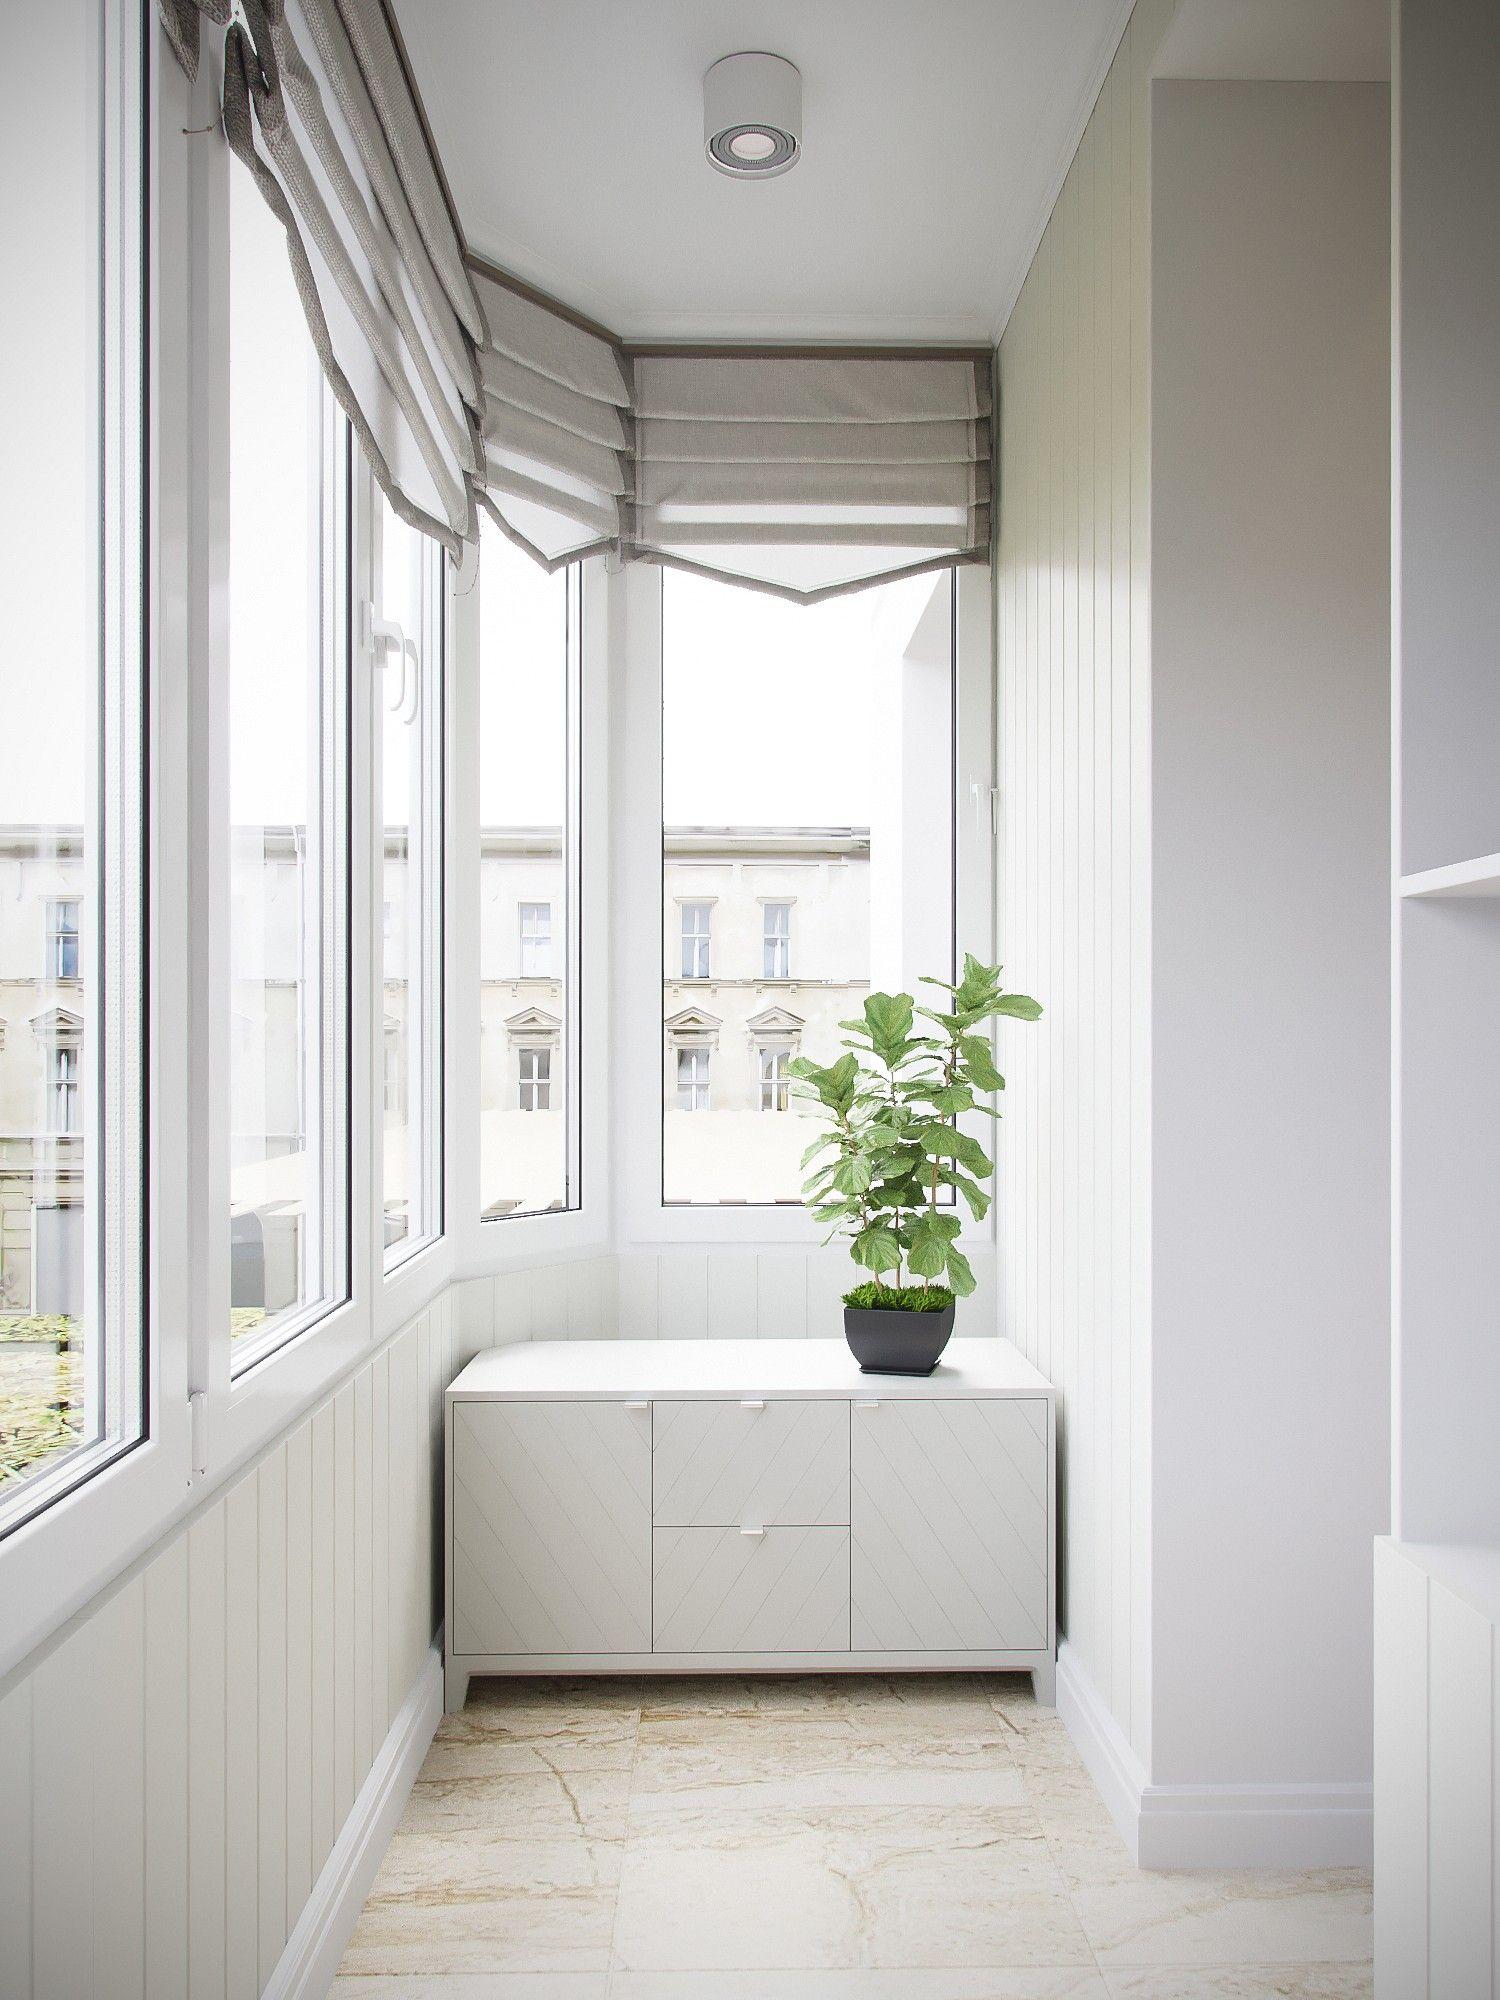 Balkon Dekoration Best Of БаРкон Дизайн однокомнатной квартиры 46 кв м в стиРе